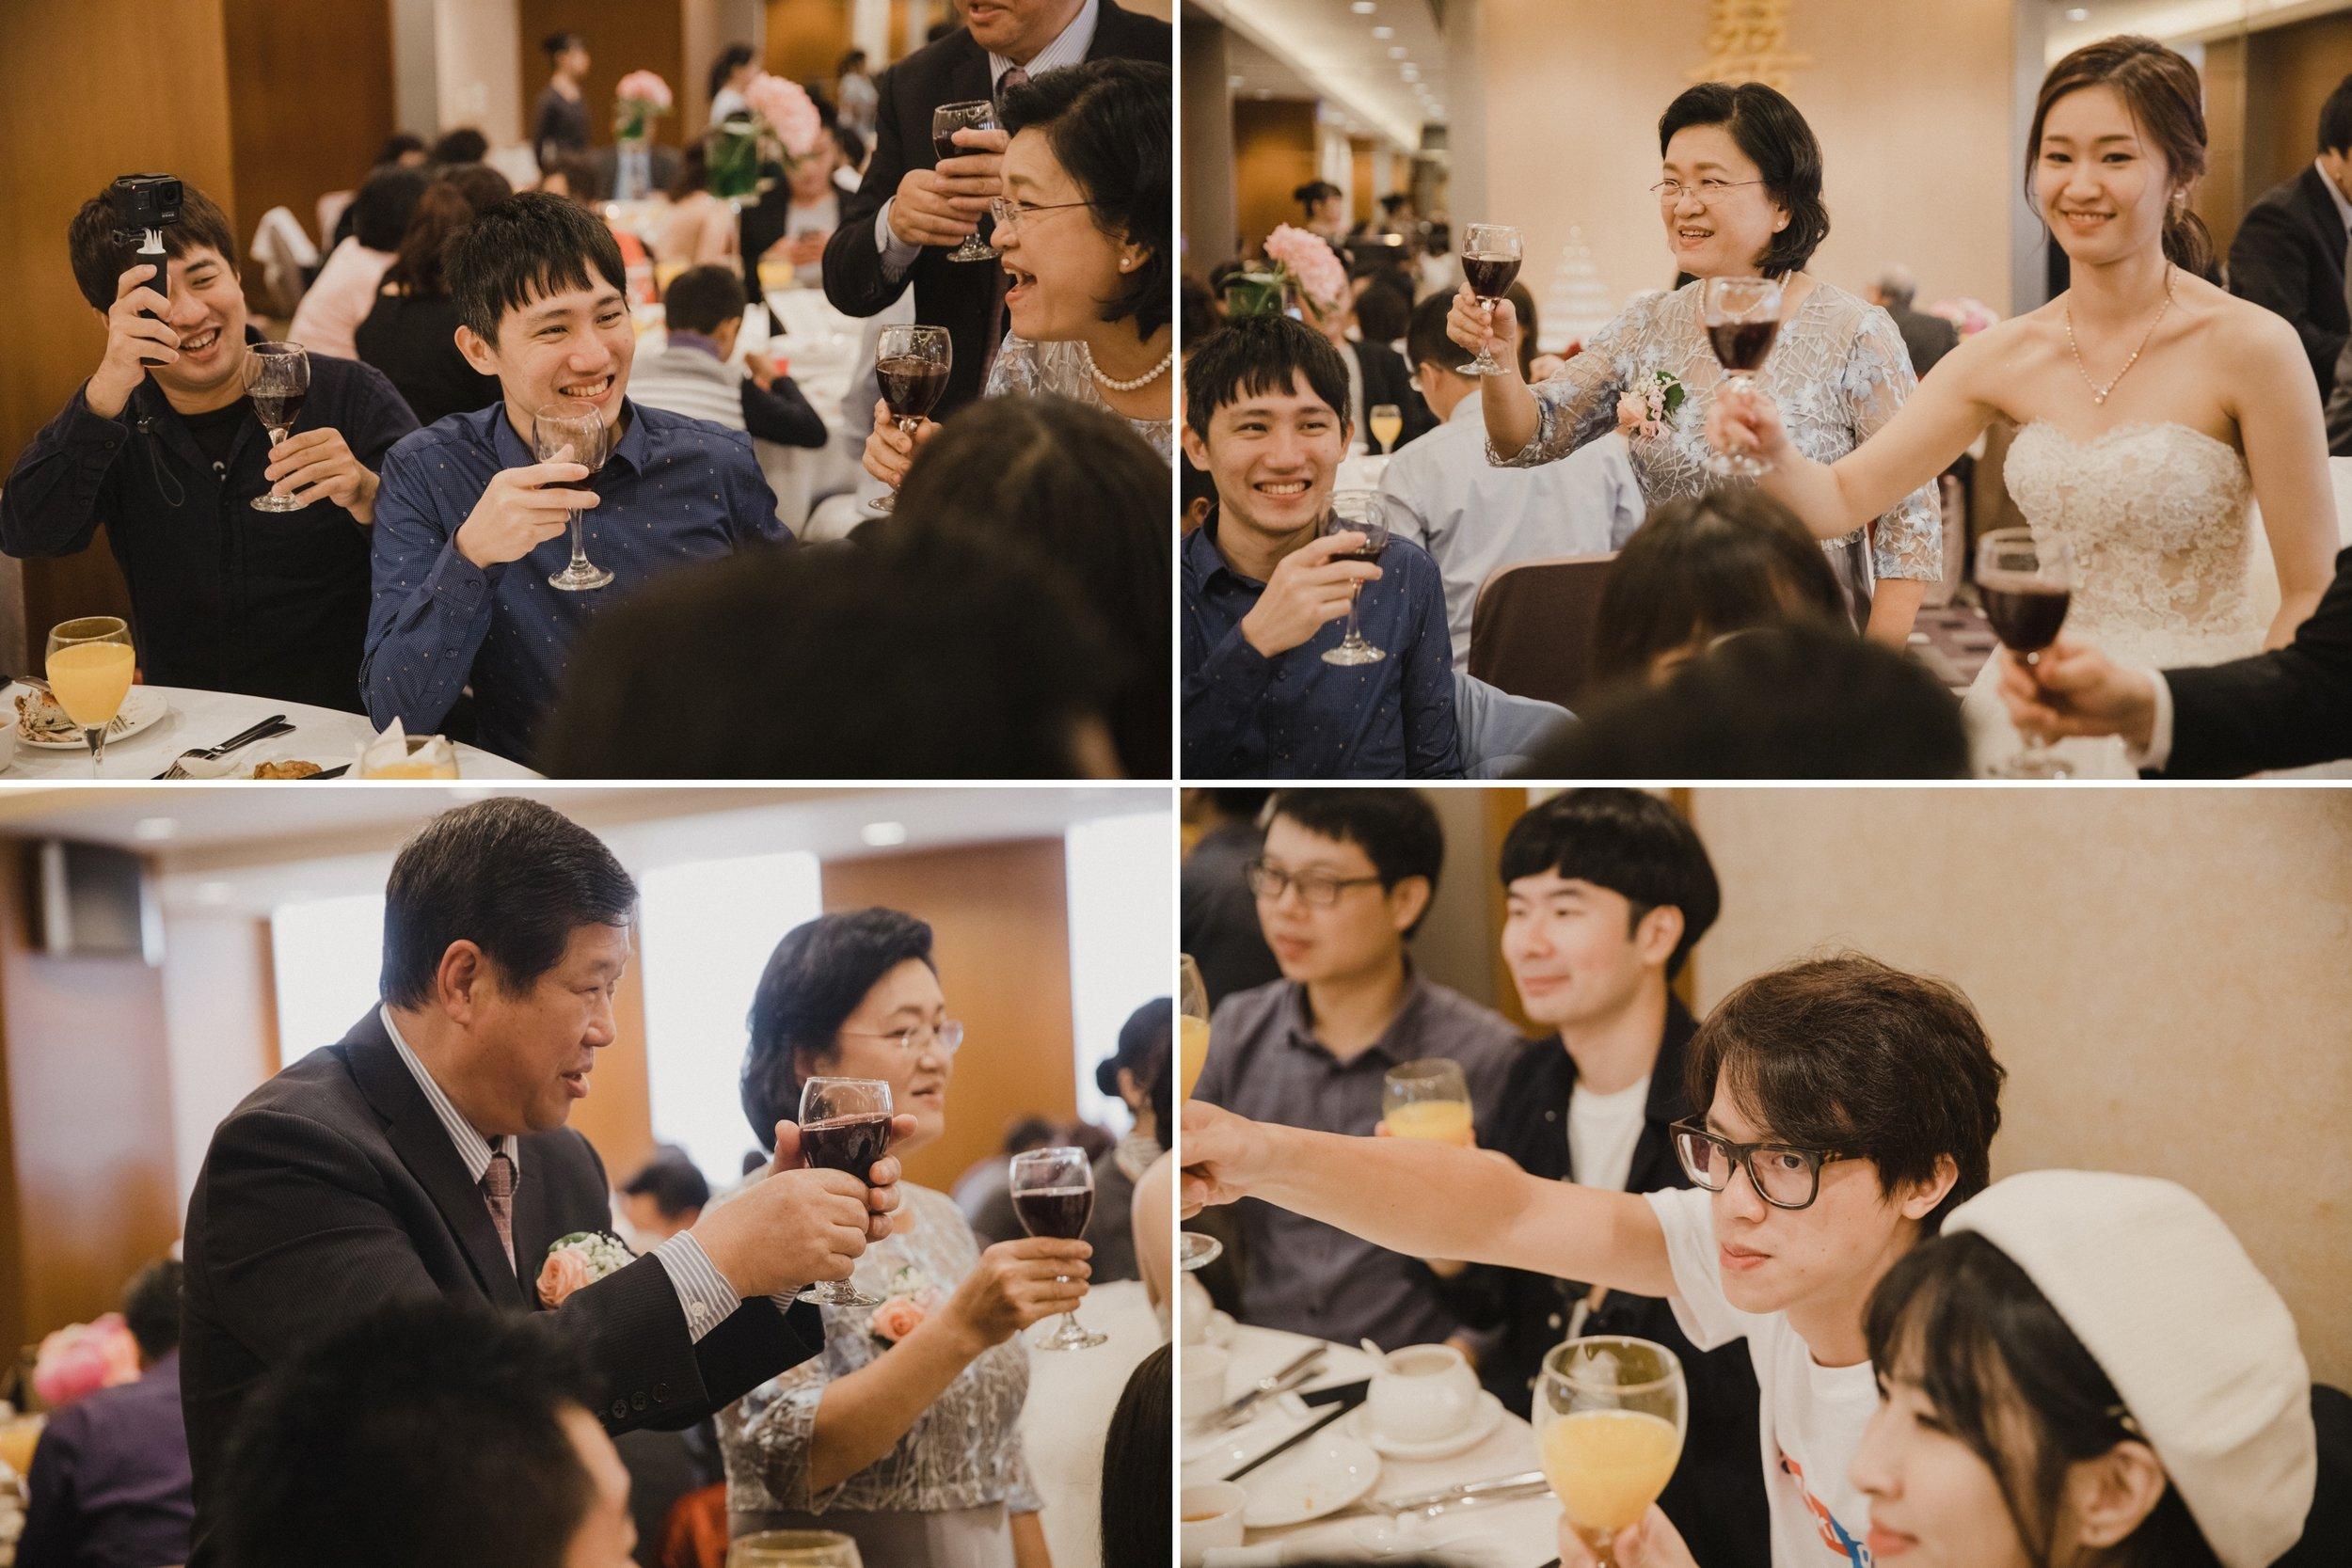 wedding-caridee-oscar-lunch-ambassador-hsinchu-結婚午宴-新竹國賓_119.jpg